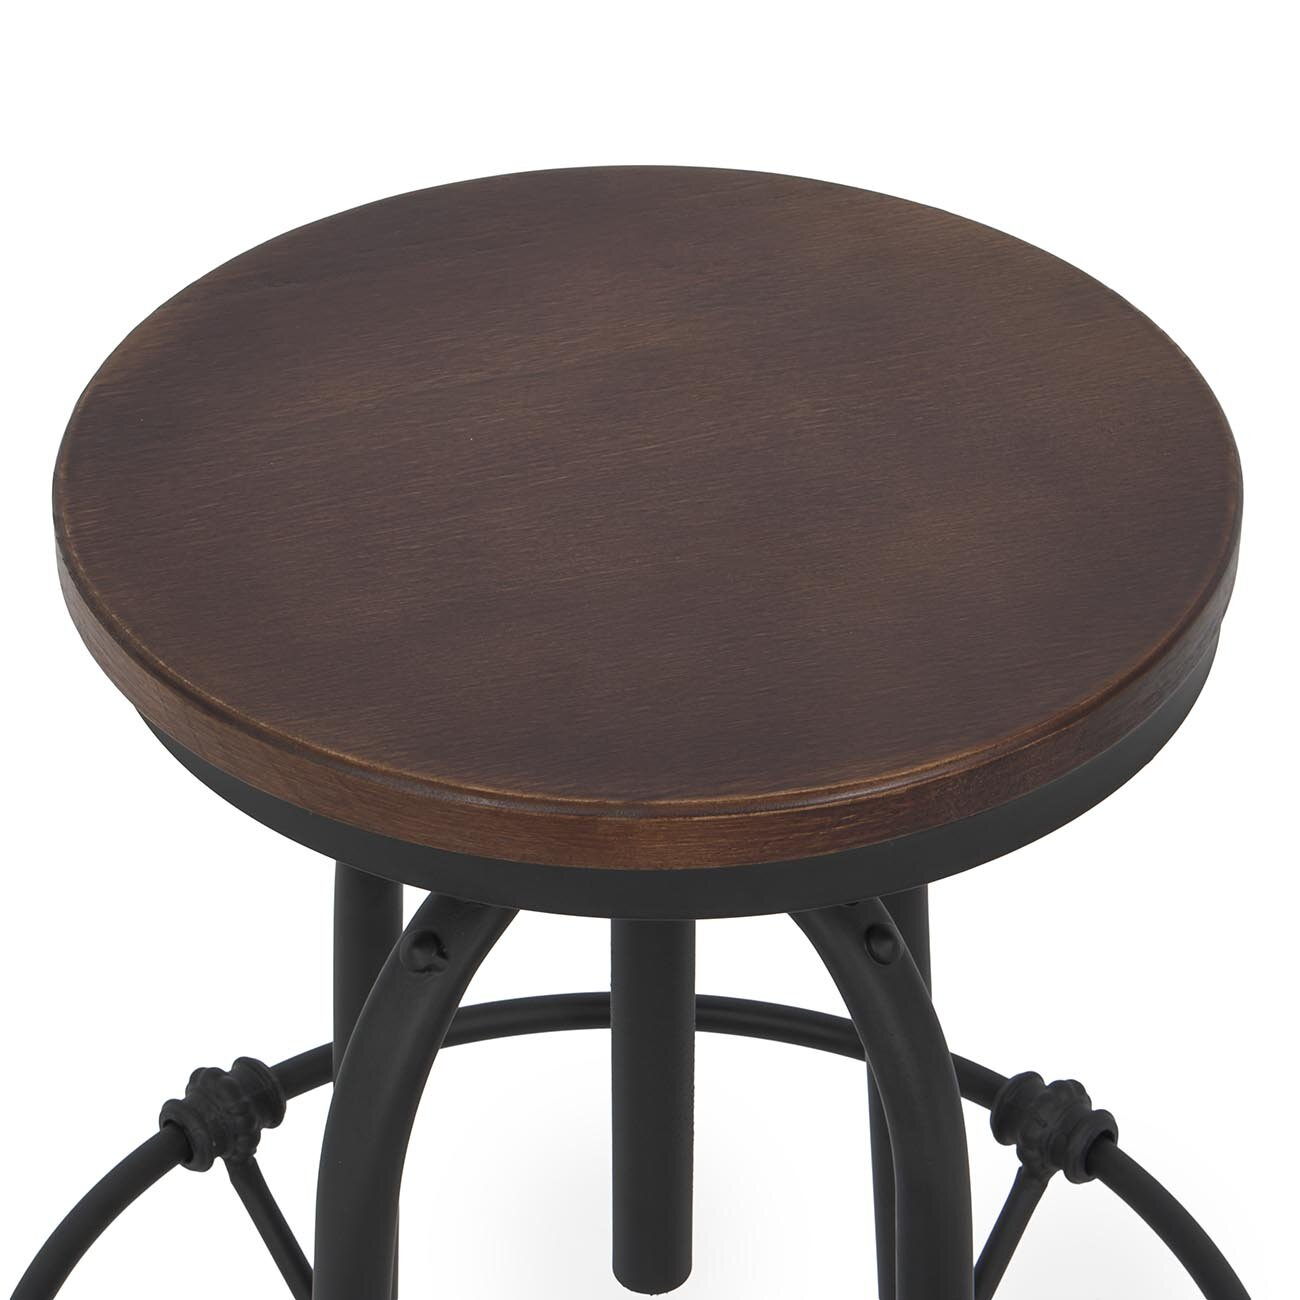 Belleze adjustable height swivel bar stool wayfair for Adjustable height bar stools